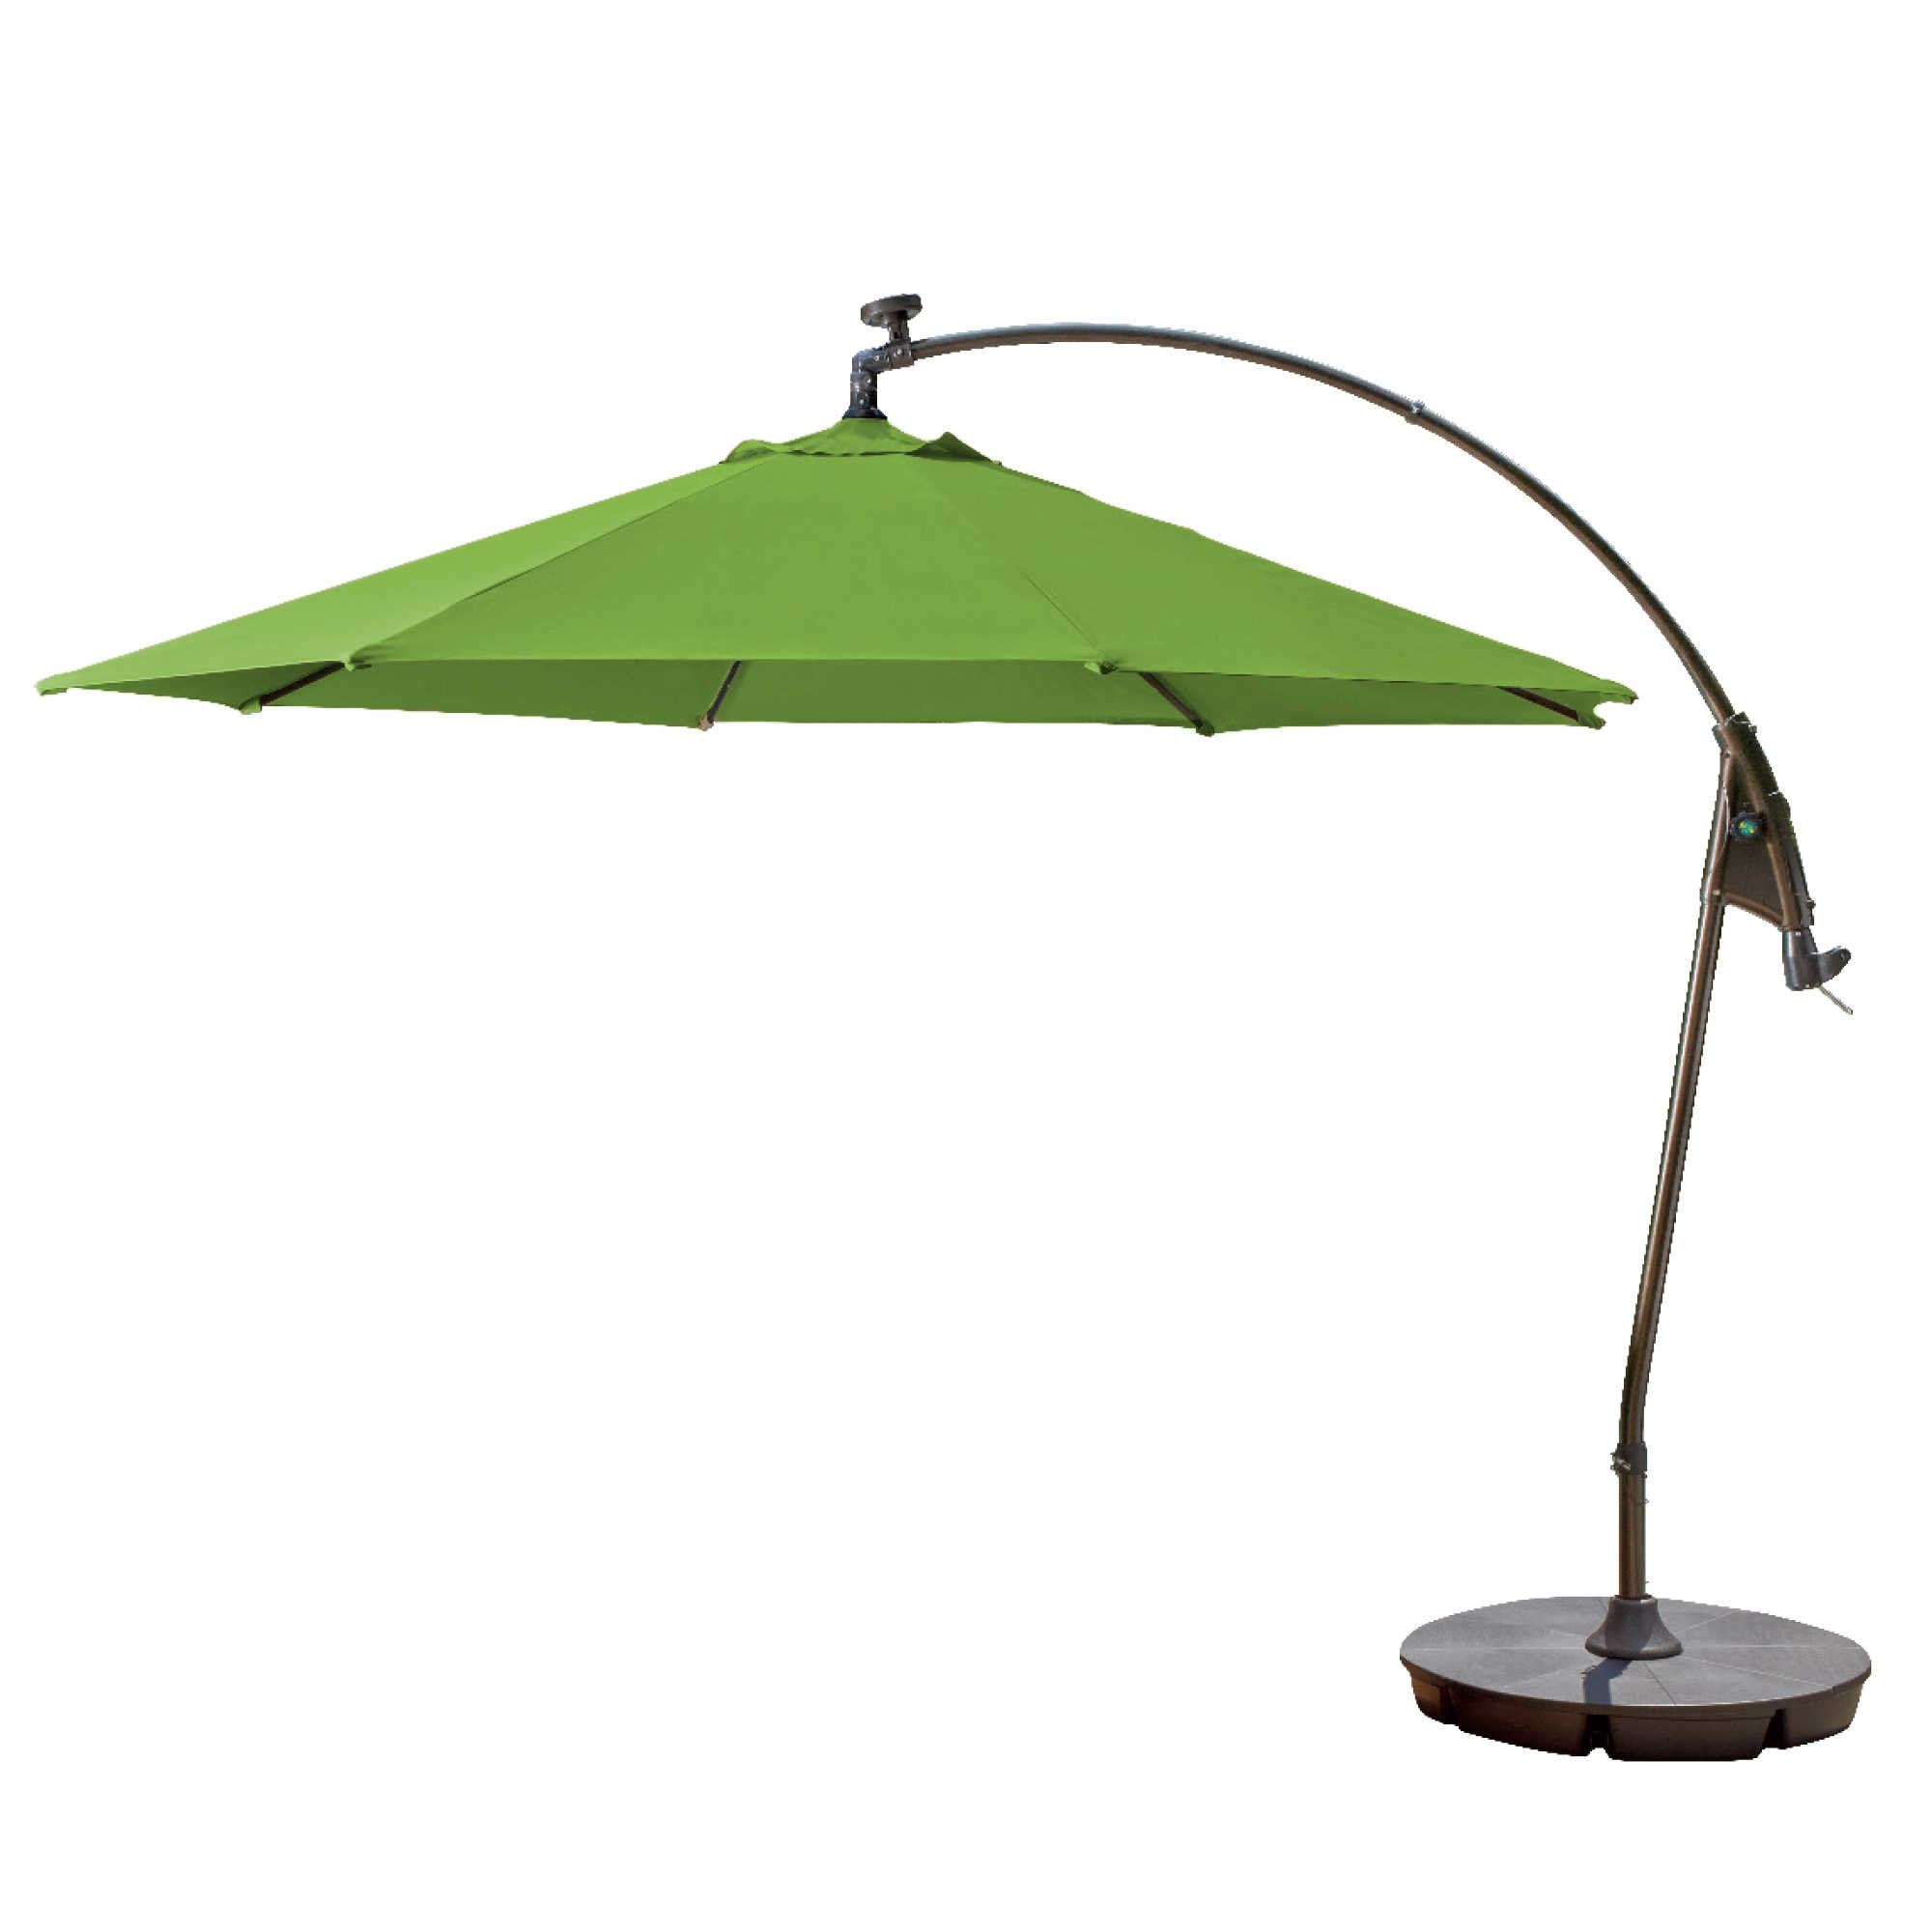 Emely Cantilever Sunbrella Umbrellas Throughout Well Known Pottsville Solar Cantilever Sunbrella Umbrella (View 10 of 20)